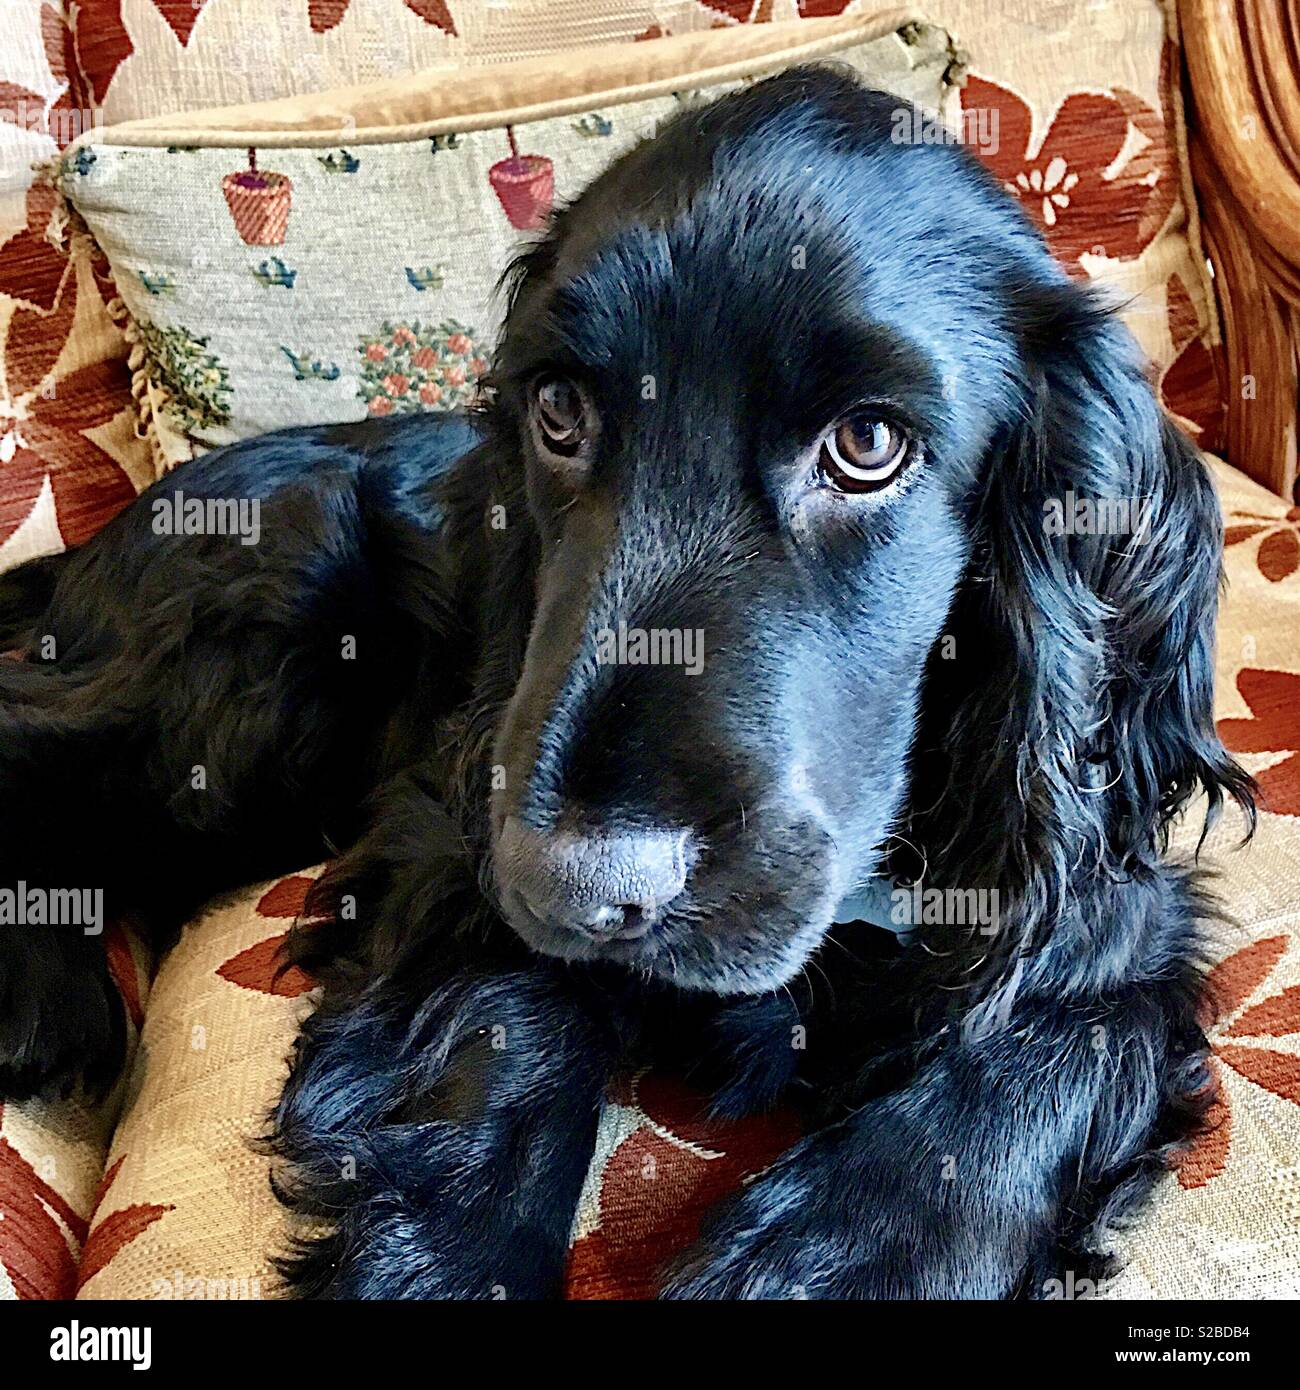 Man's best friend - Stock Image